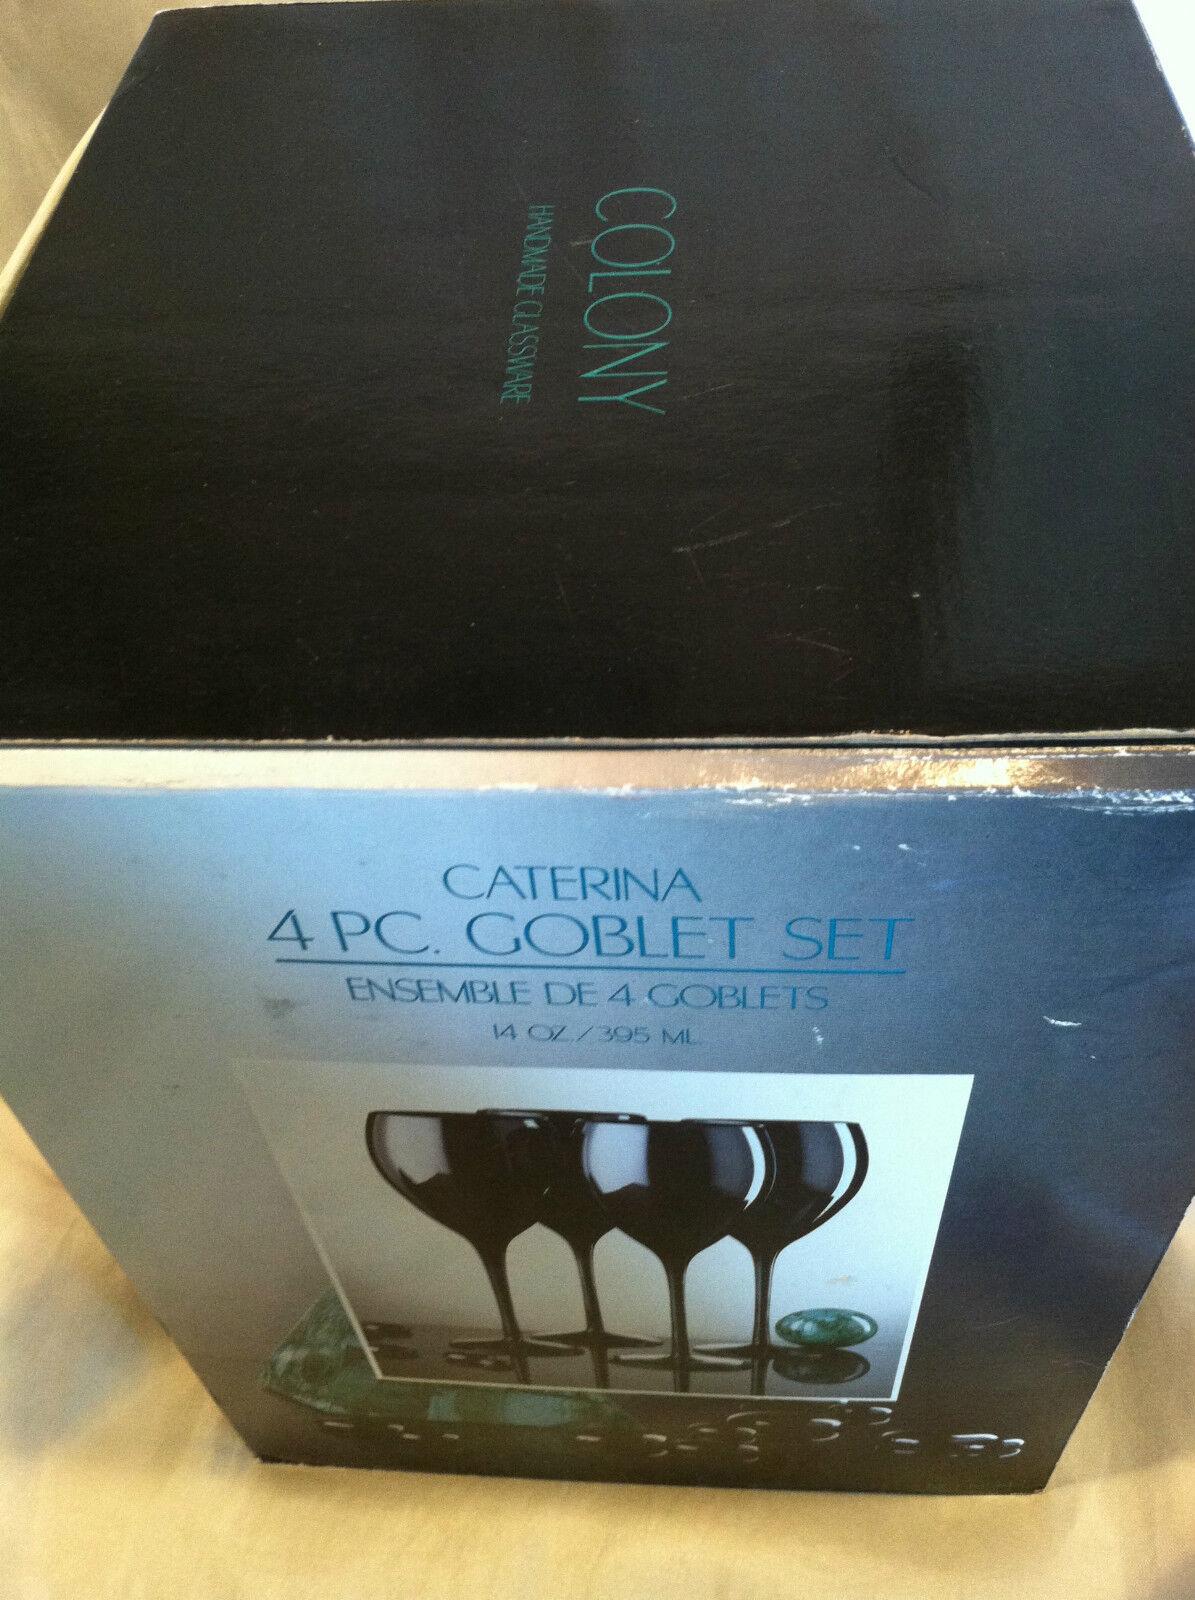 RARE 4 PC SET COLONY HANDMADE CATERINA GOBLET SET 14OZ WINE GLASSES-NEW+BOX